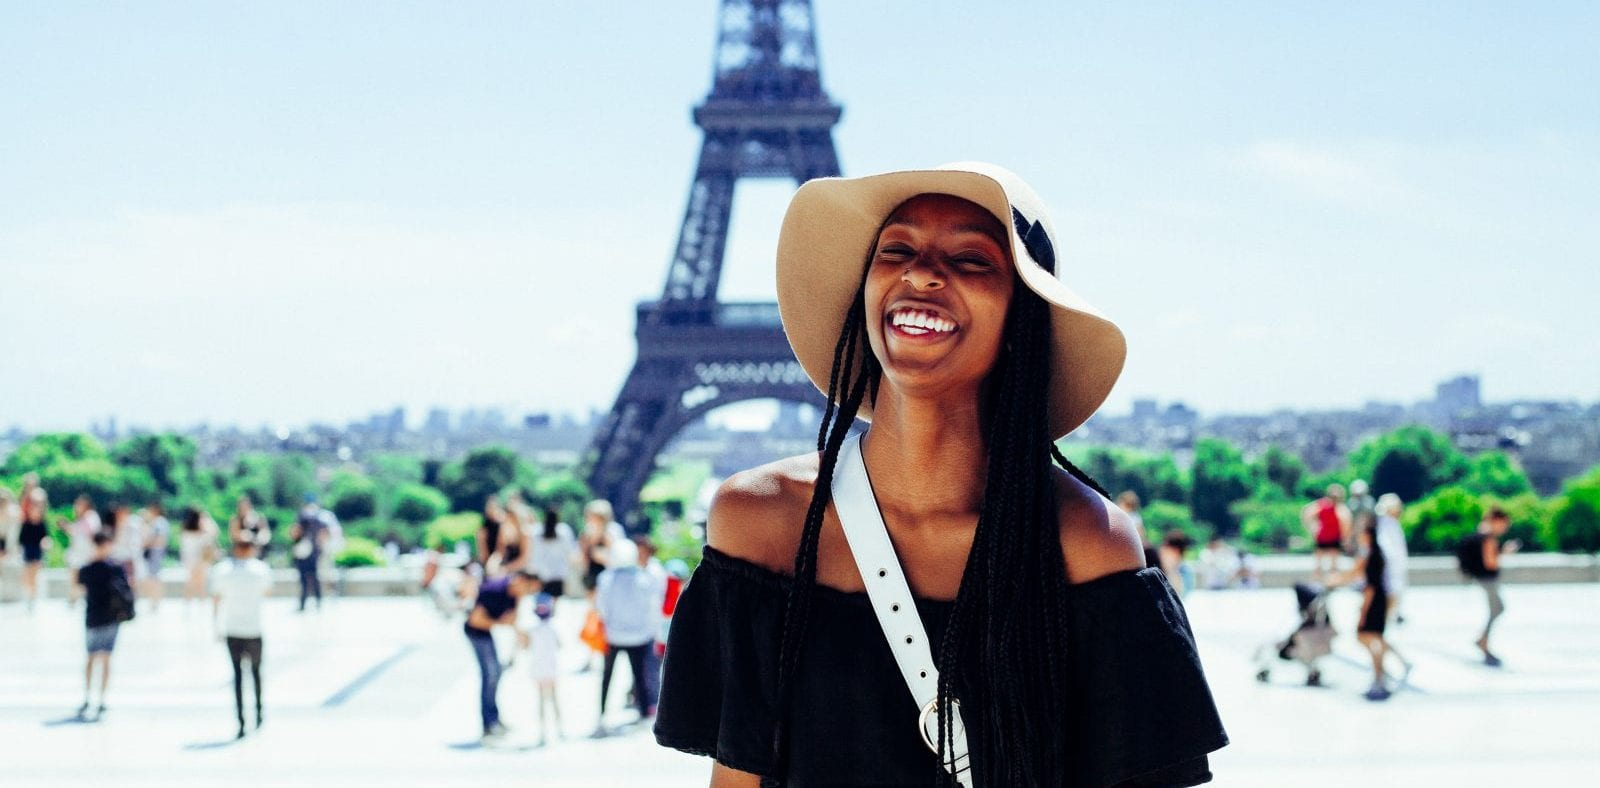 woman standing outside Eiffel tower